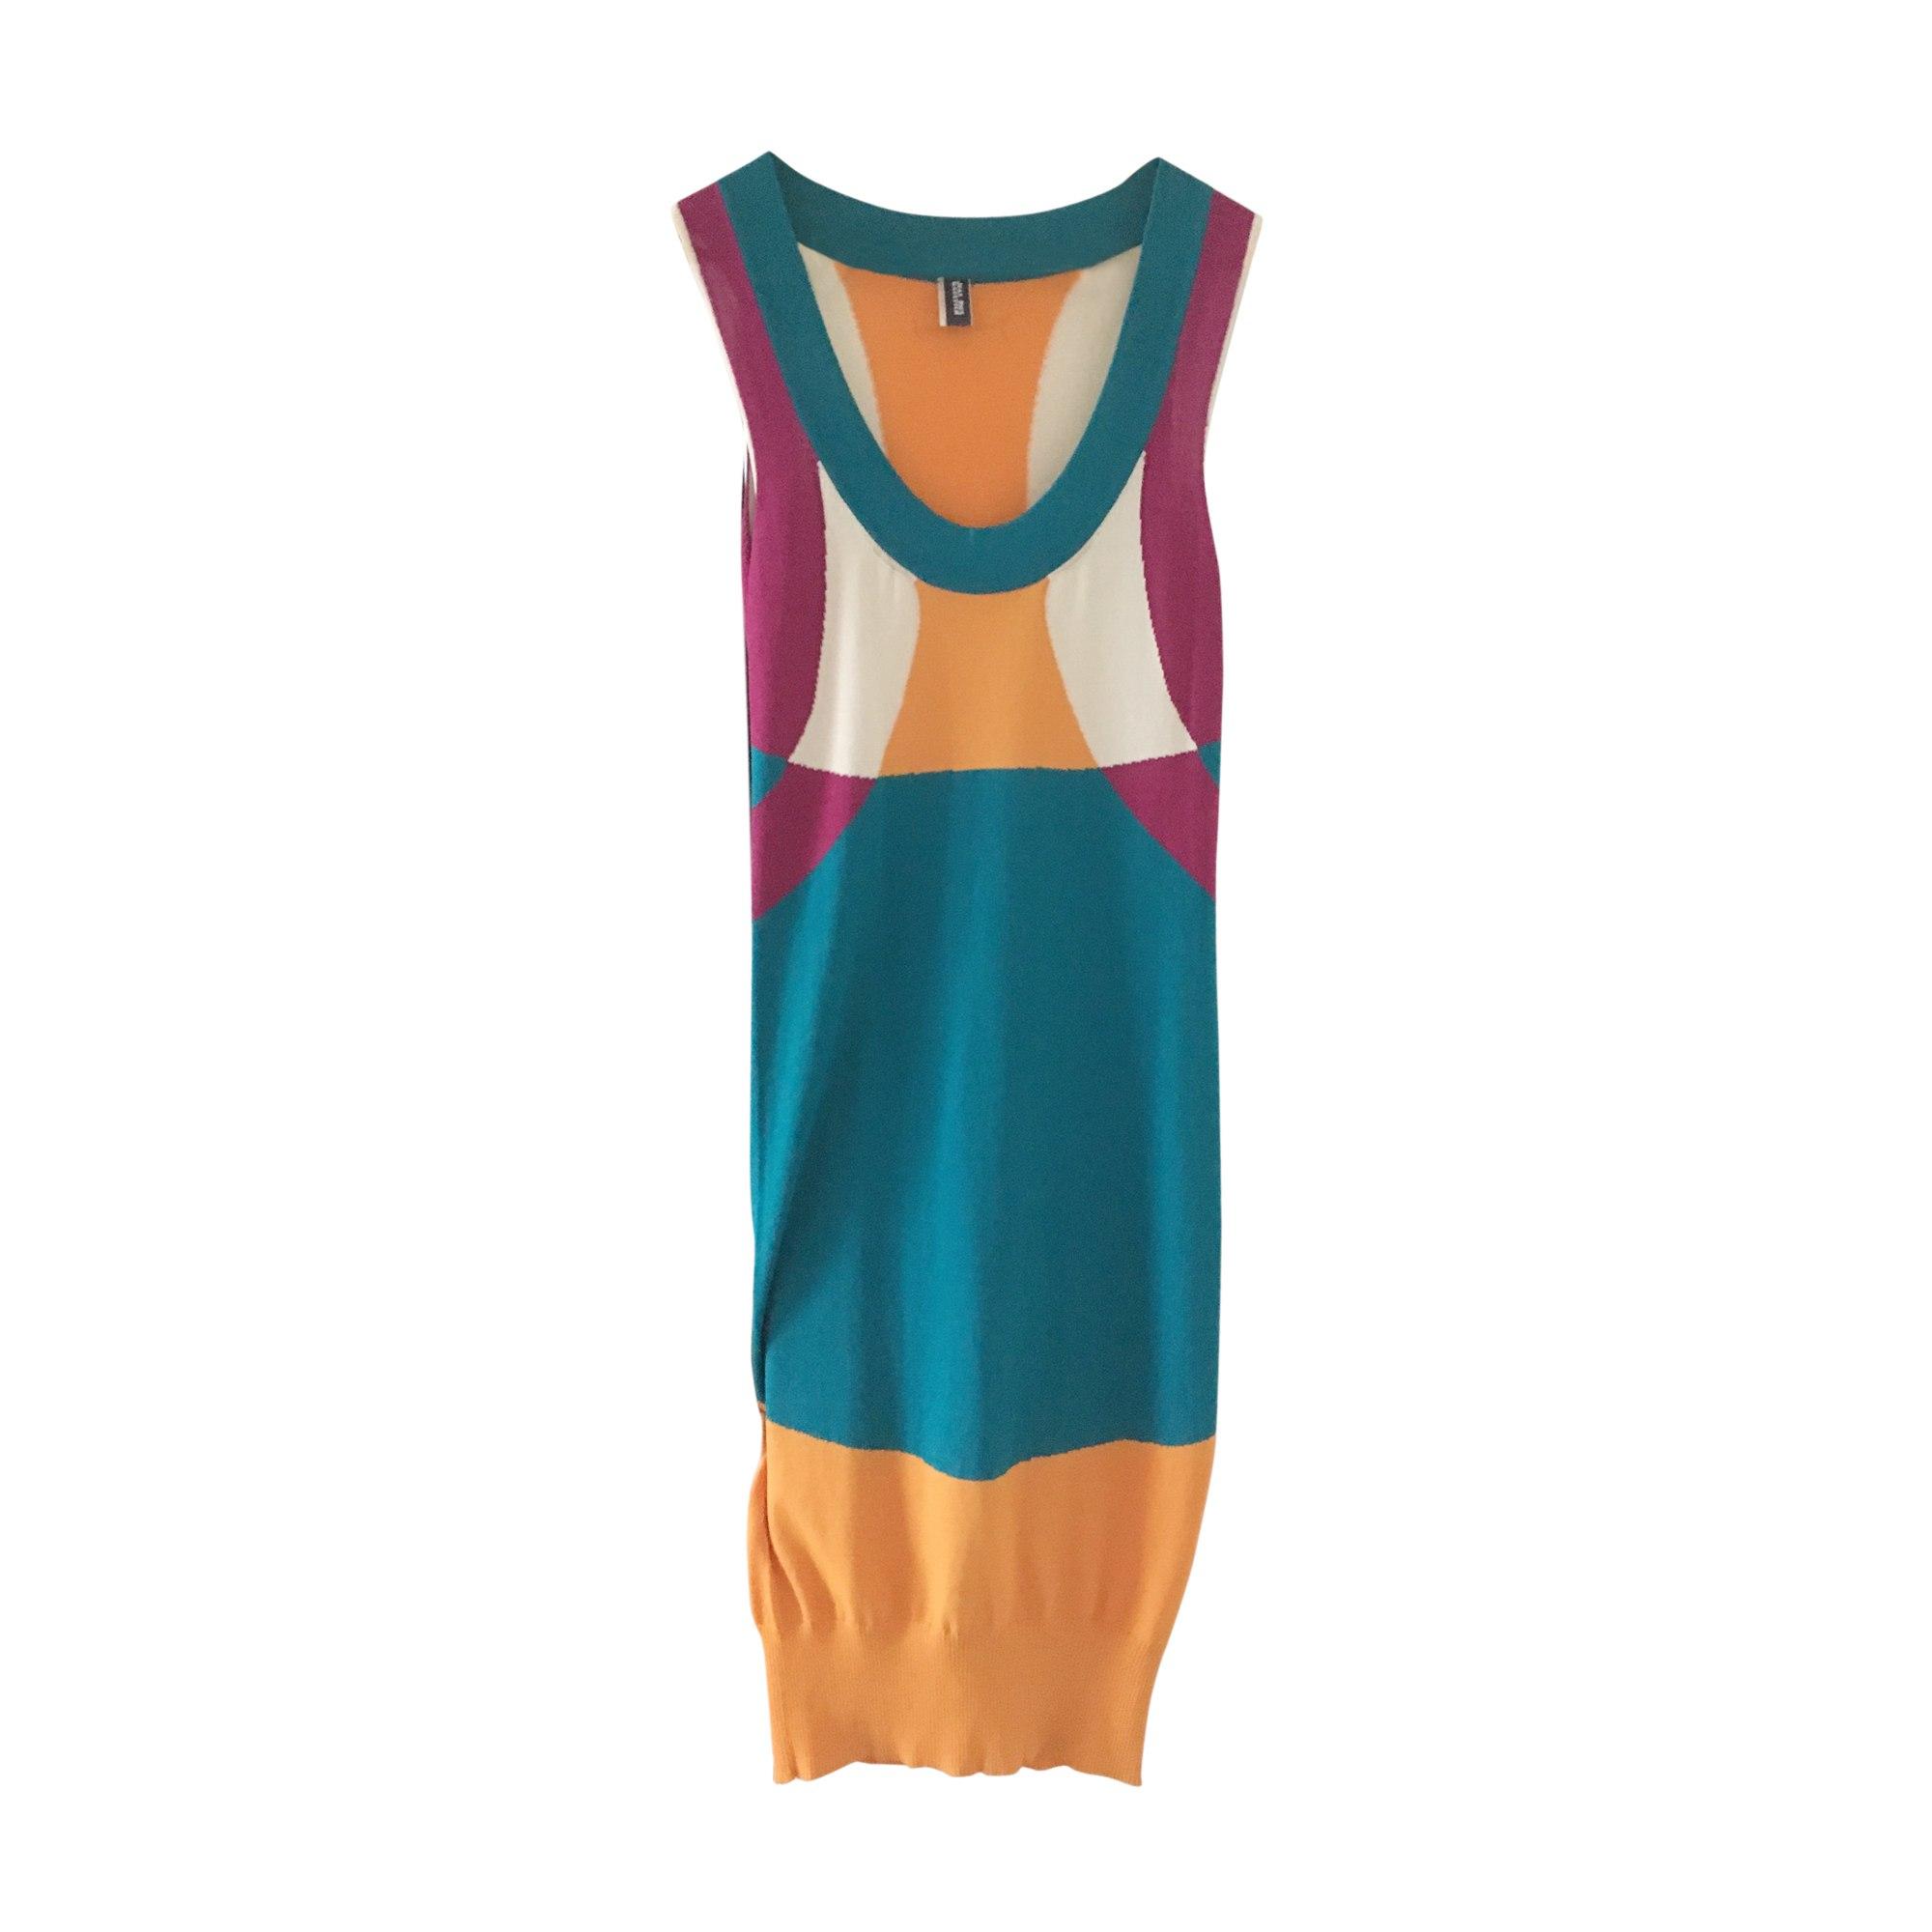 b69b924ff8f Robe mi-longue JEAN PAUL GAULTIER Turquoise